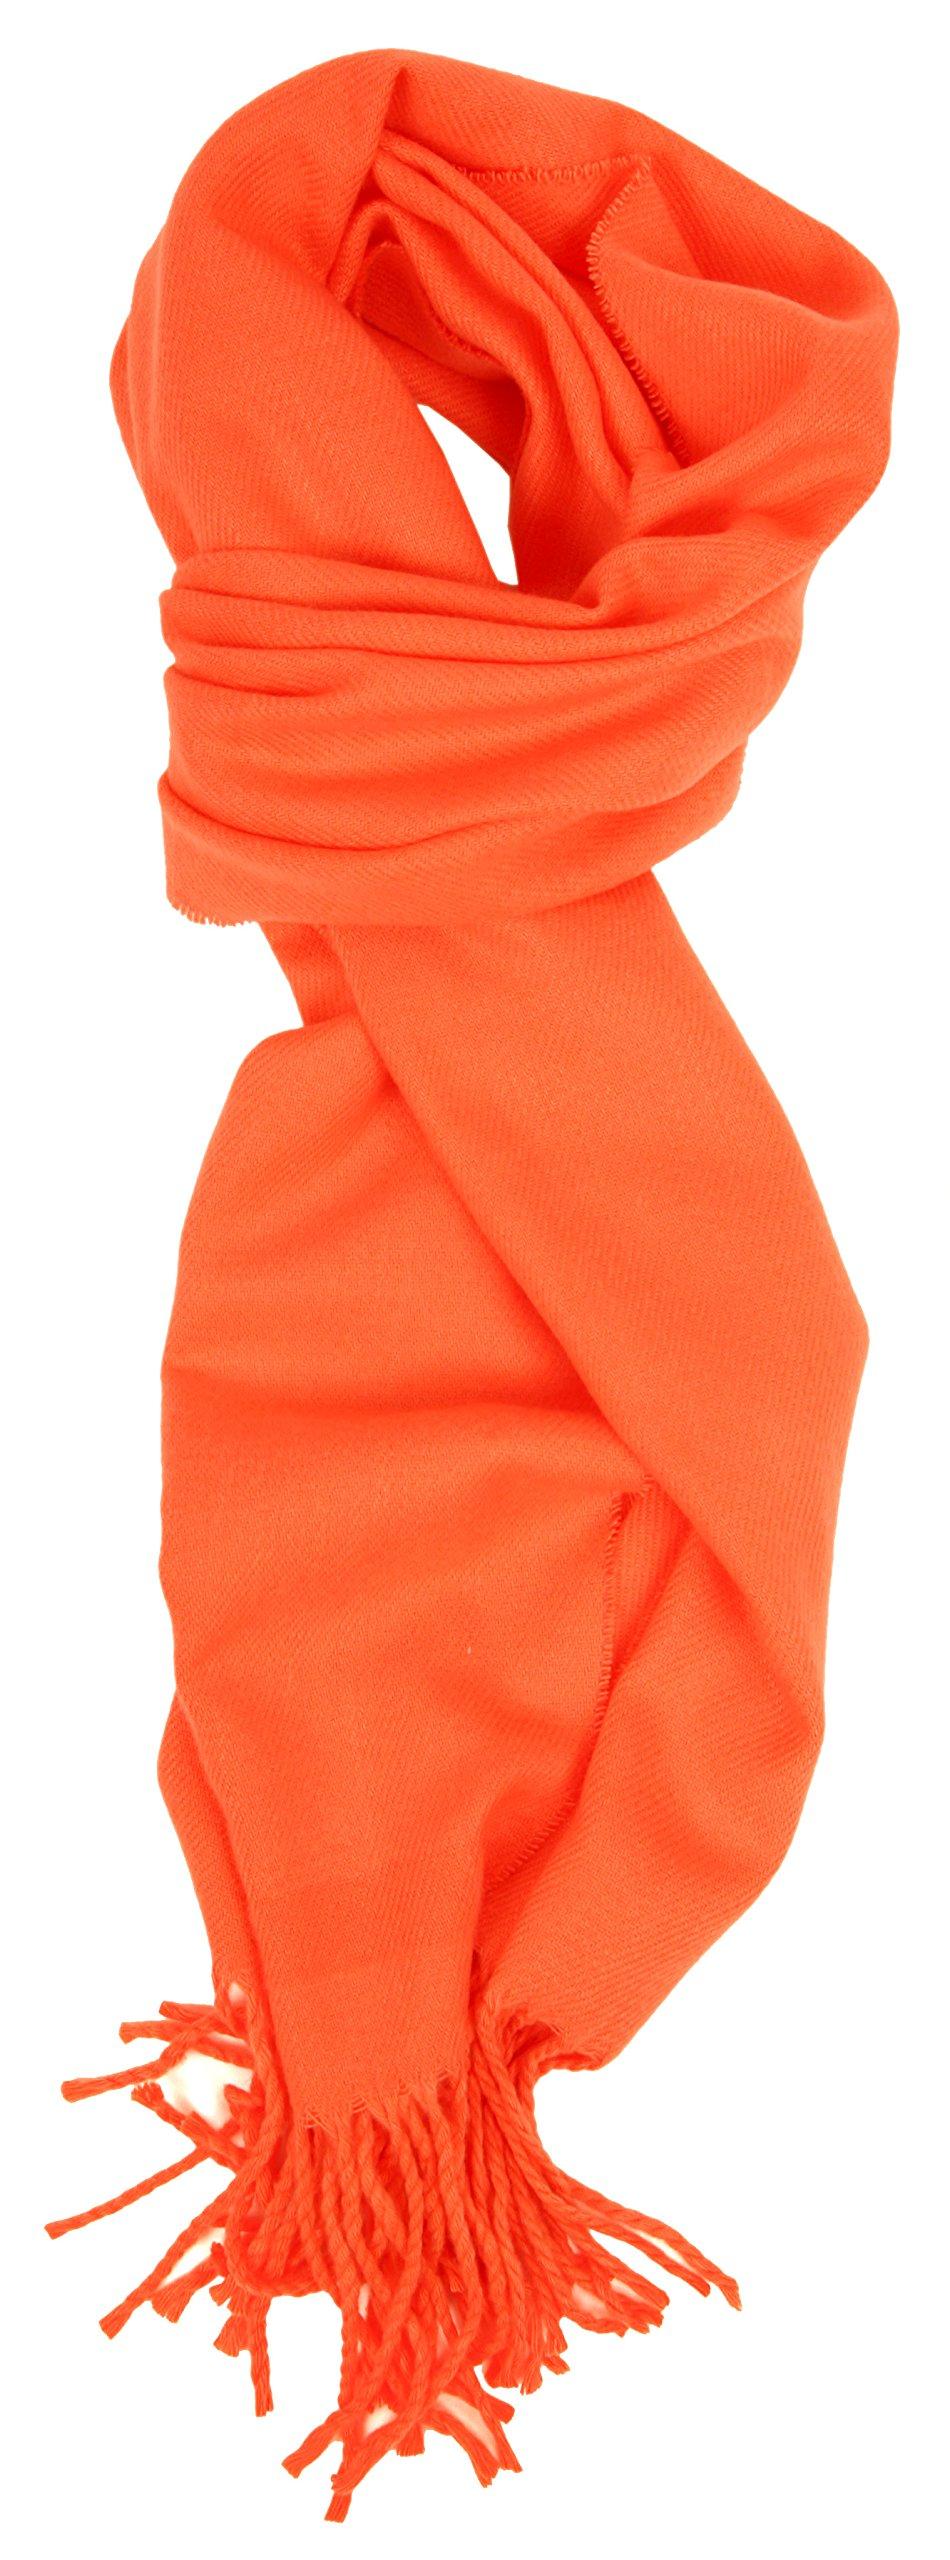 Love Lakeside-Women's Cashmere Feel Winter Solid Color Scarf 0-0 Orange